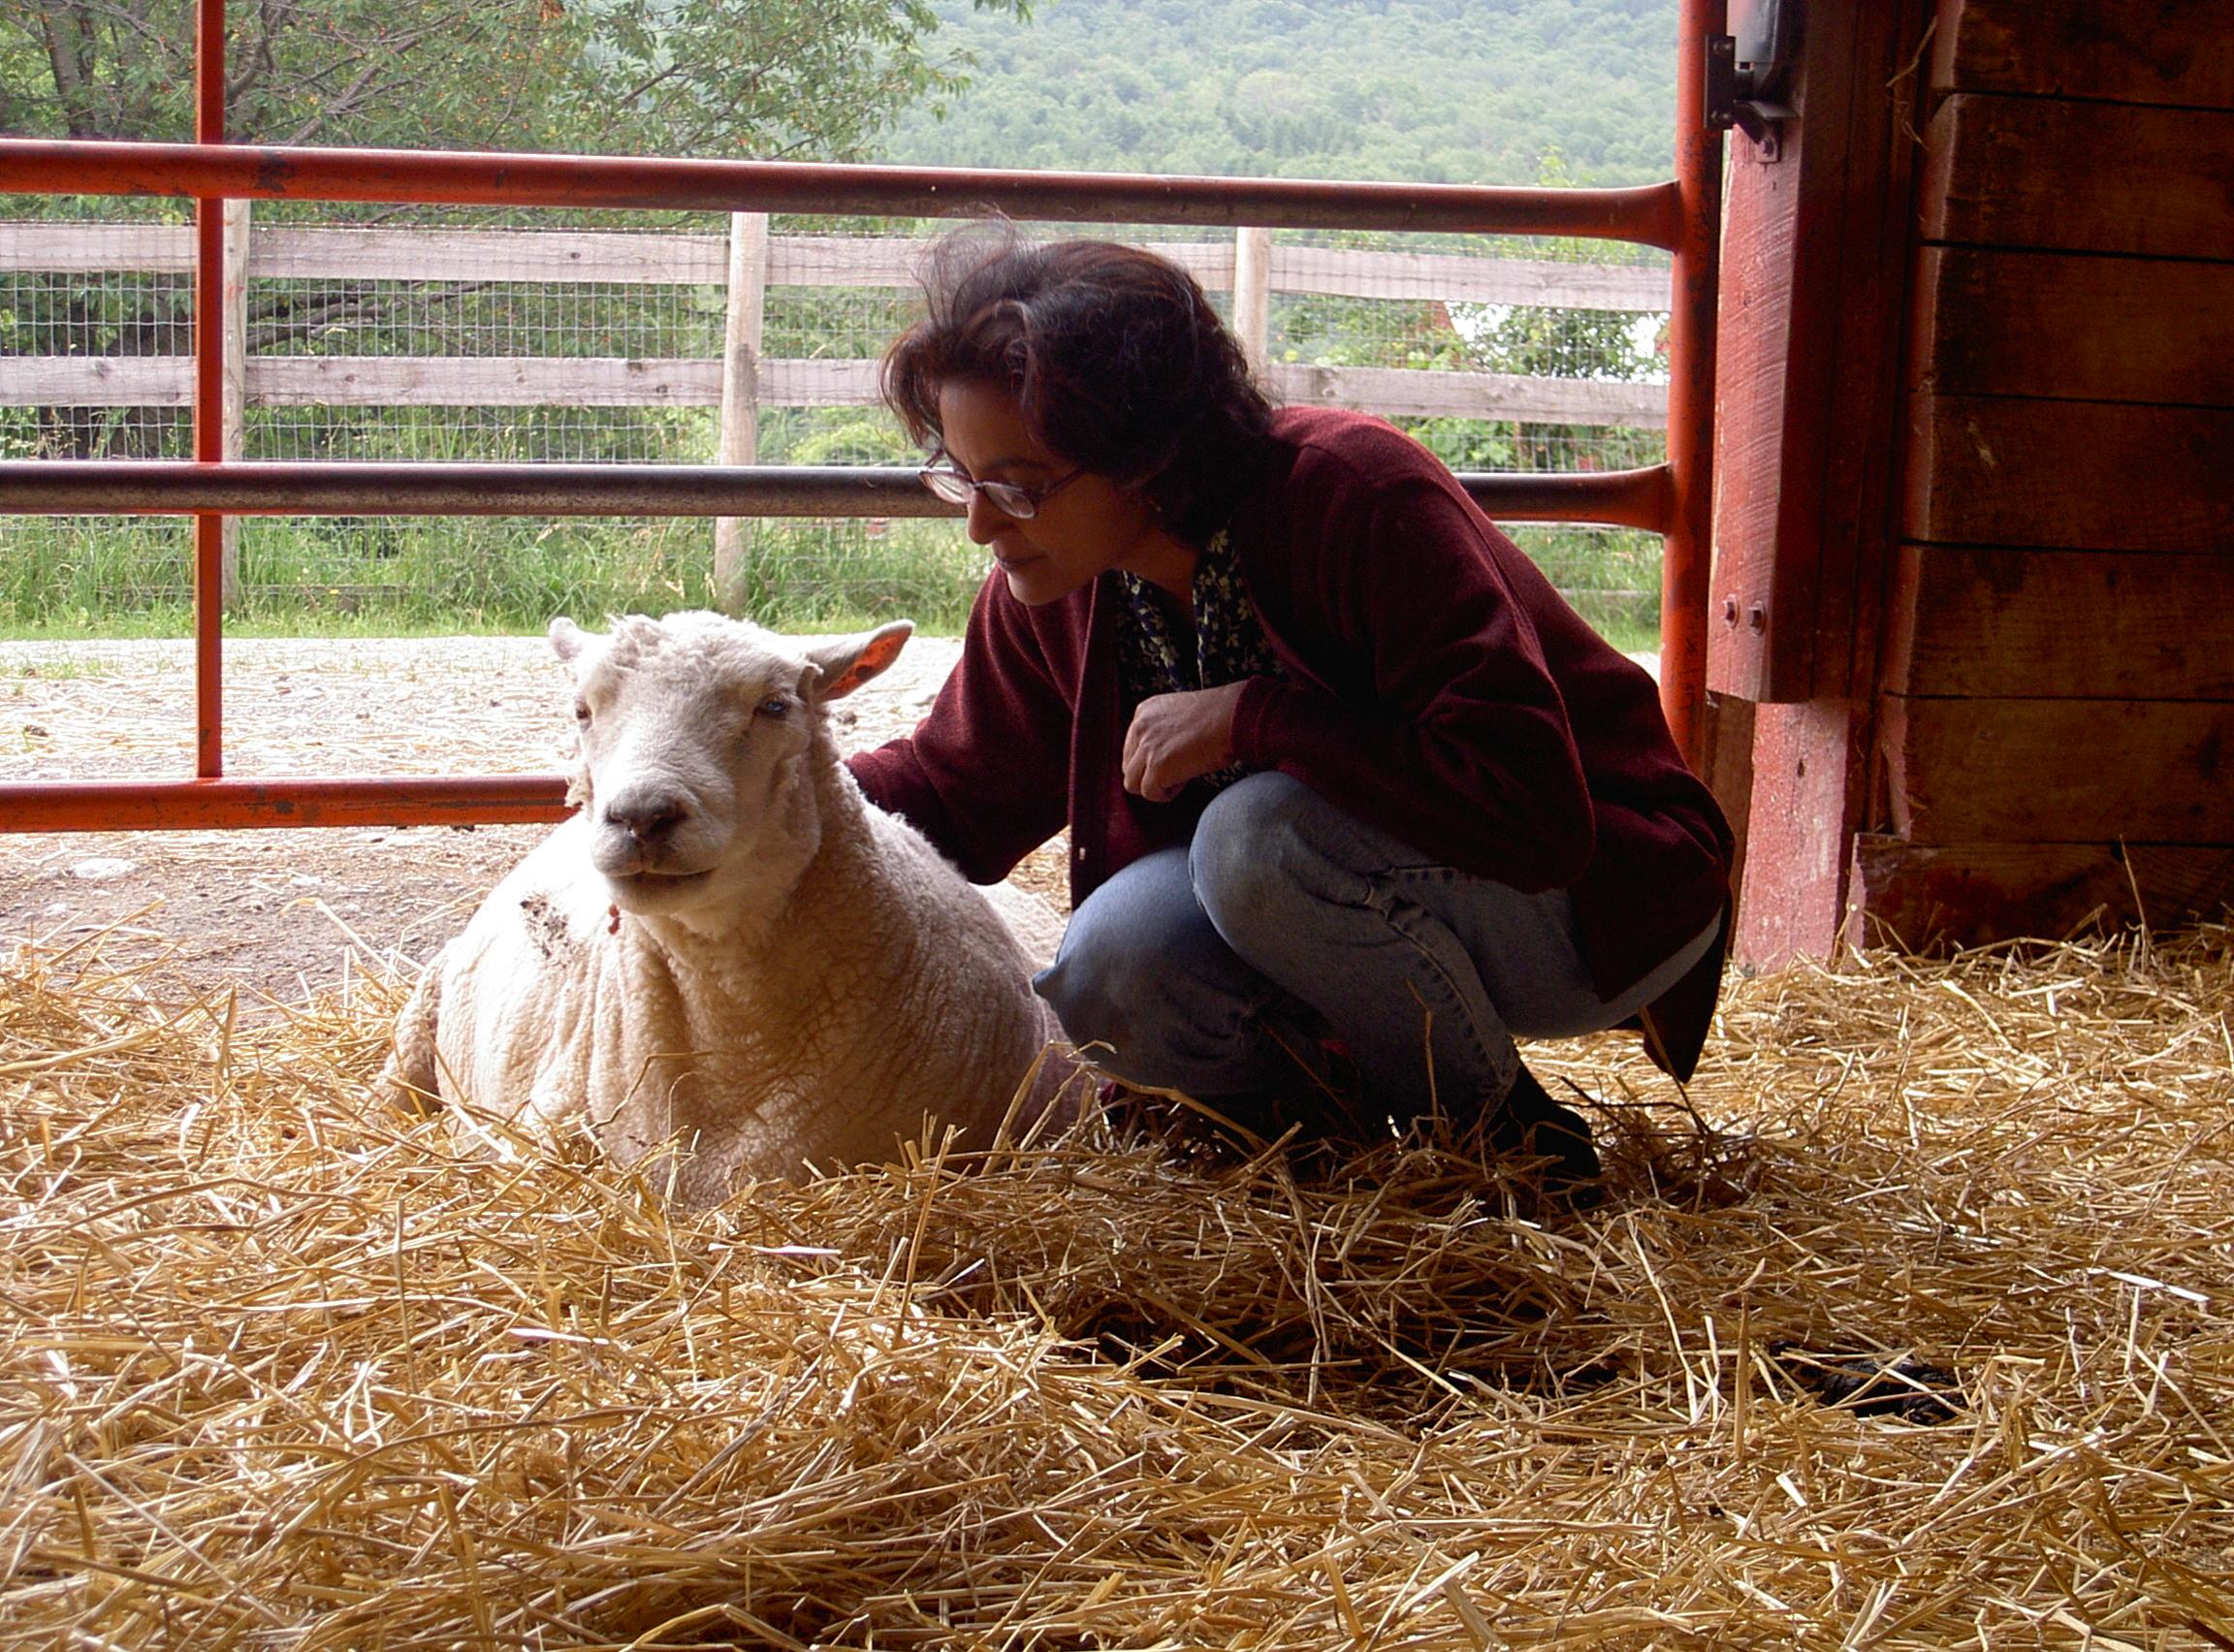 Nandita Shah at Farm Sanctuary